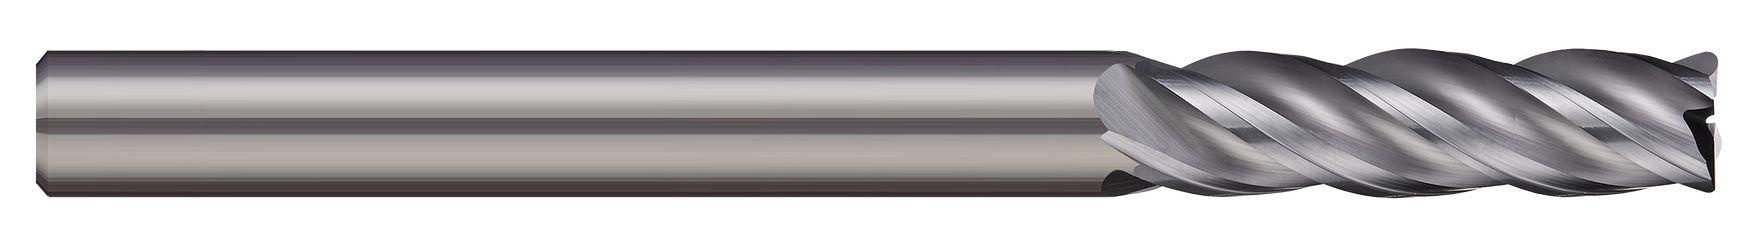 tool-details-VLM-312-4